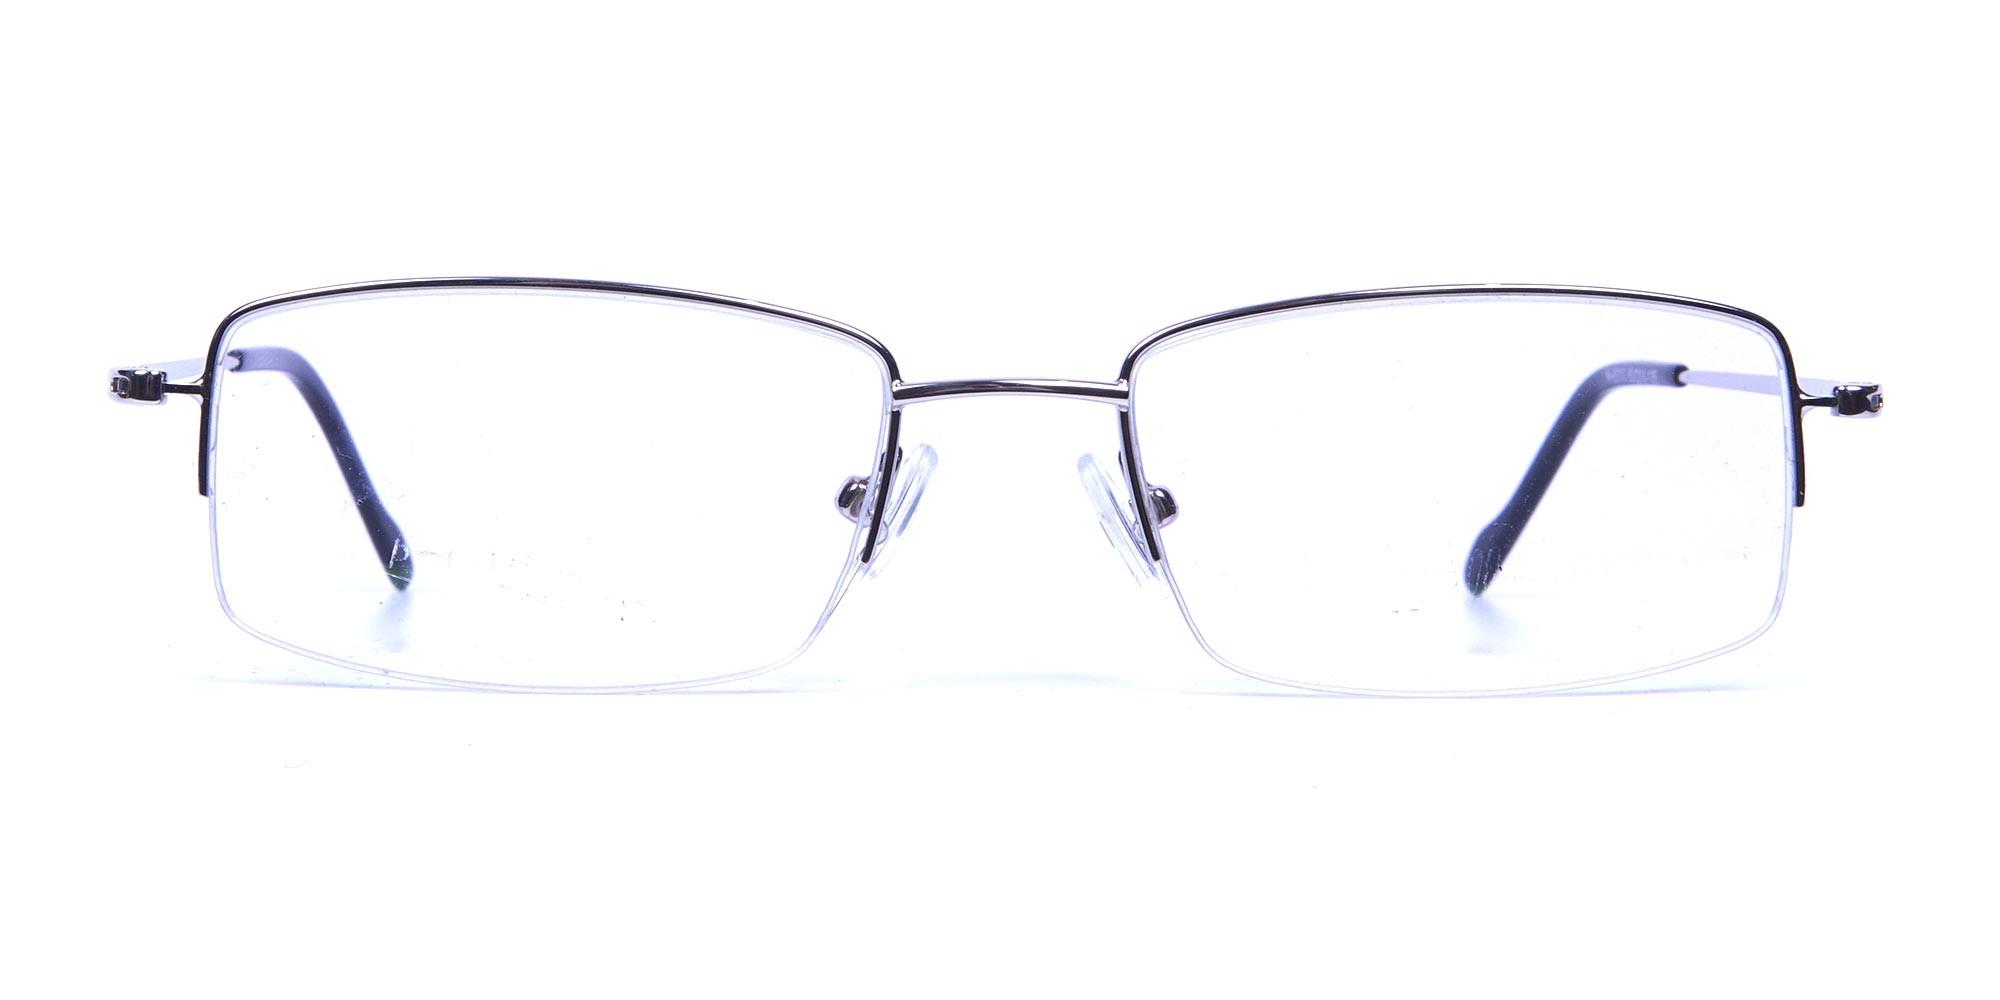 Rectangular Eyeglasses in Silver, Eyeglasses - 1